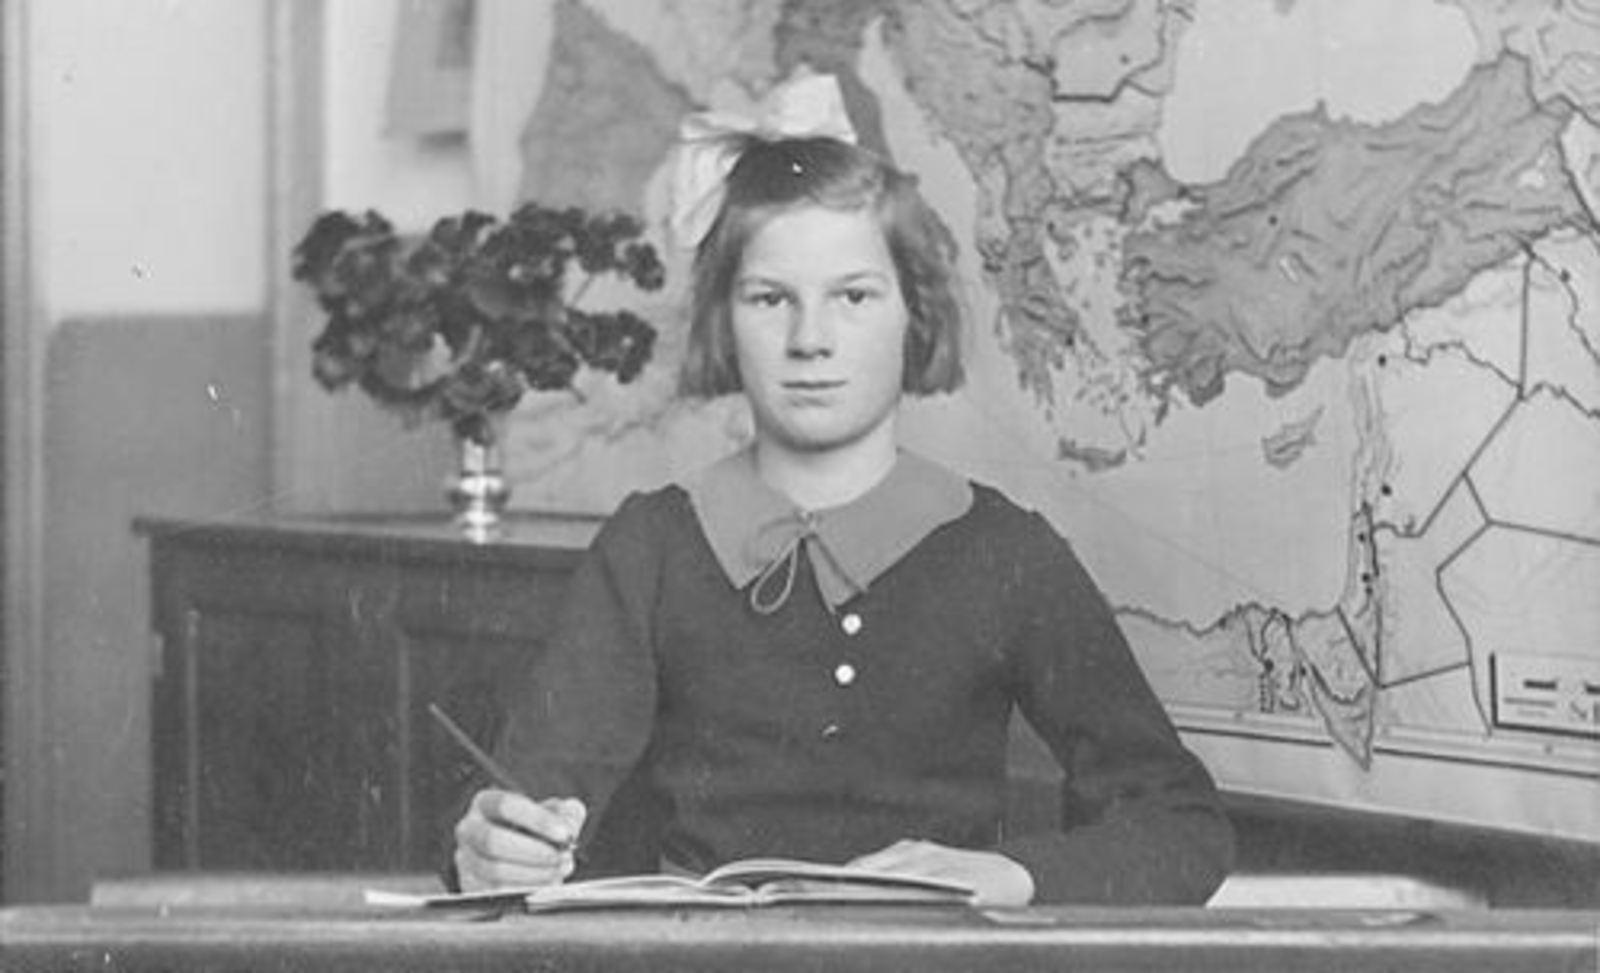 Bliek Jannie 1927 19__ Schoolfoto